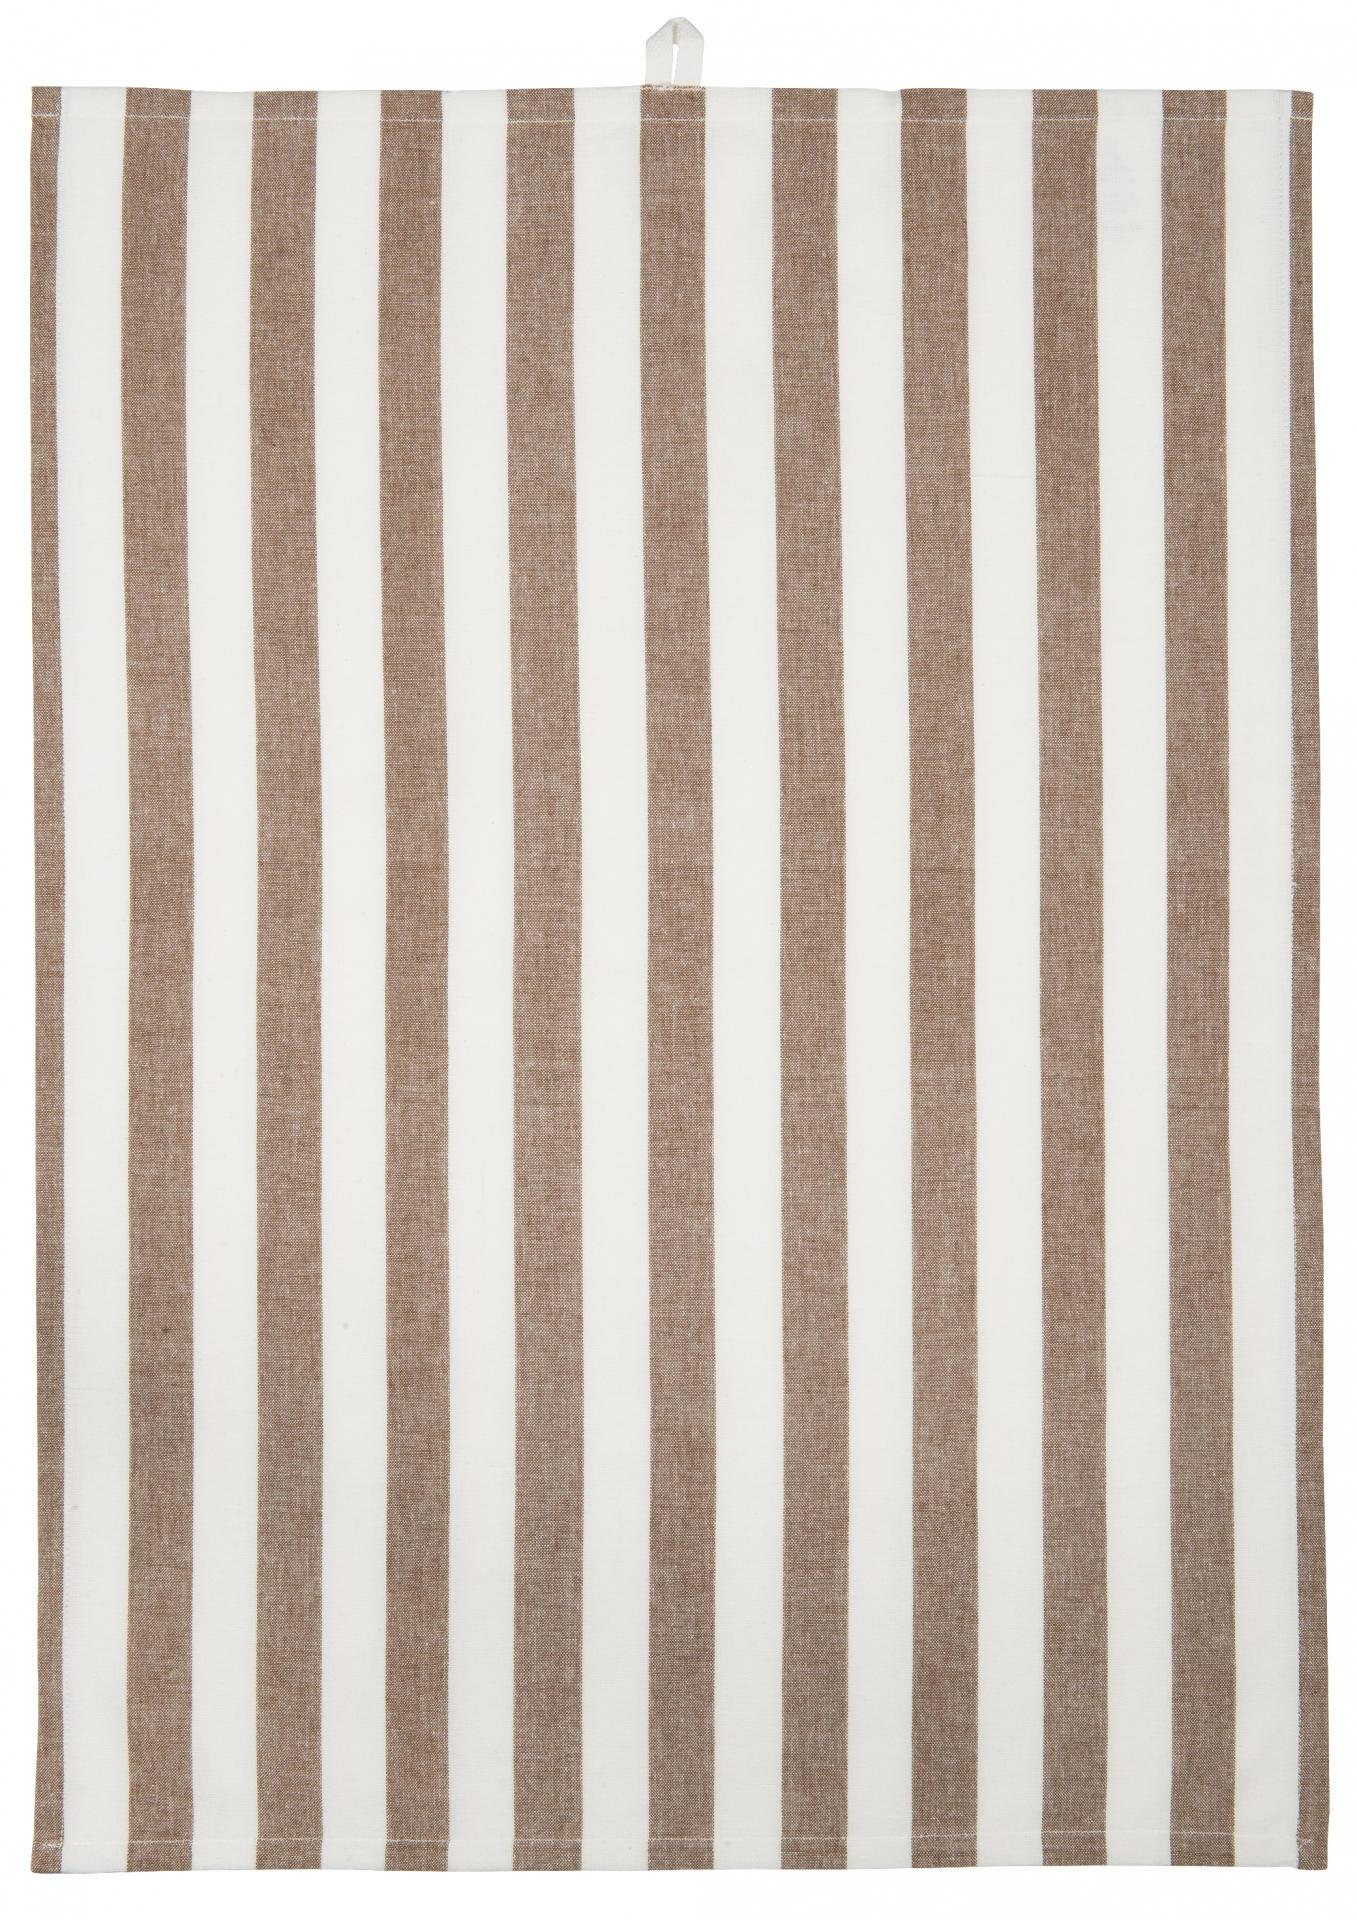 IB LAURSEN Utěrka Stripes brown